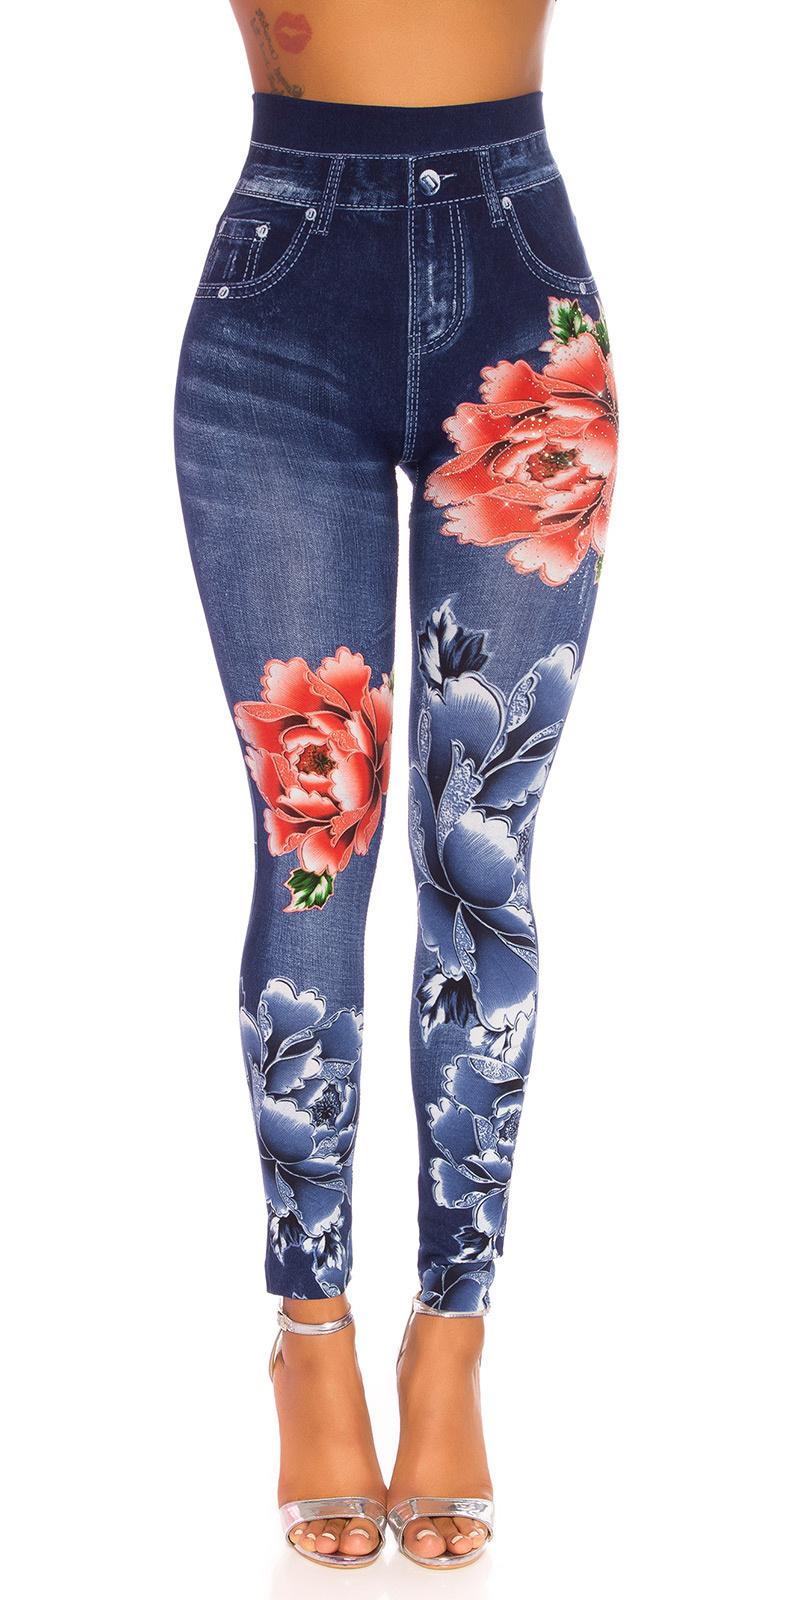 Sexy Highwaist Jeanslook Leggings Blue